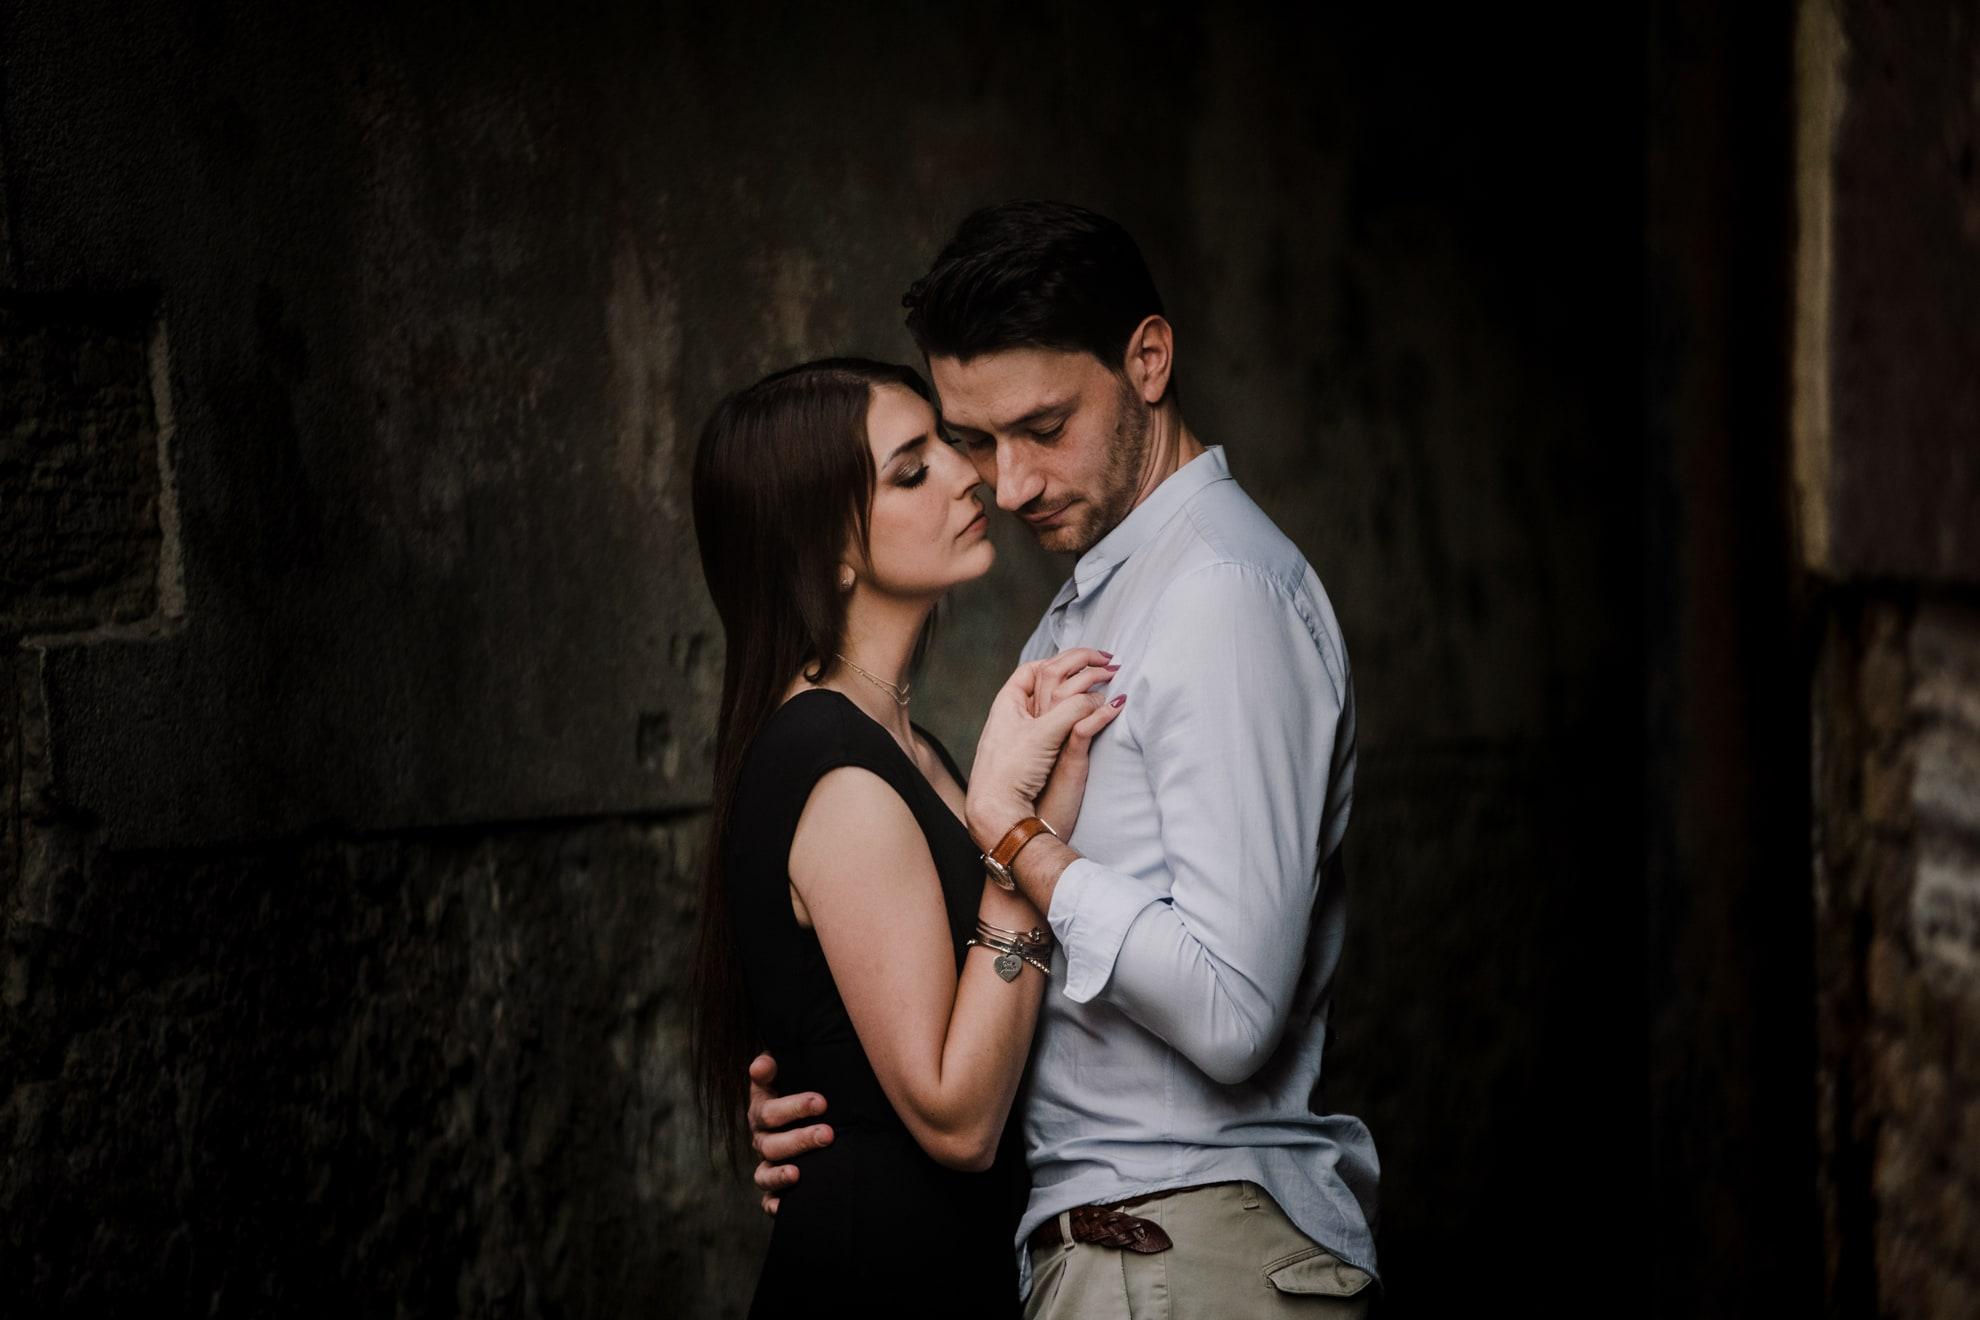 engagement venice venezia proposal proposta matrimonio fidanzamento irene pollacchi fotografa 3